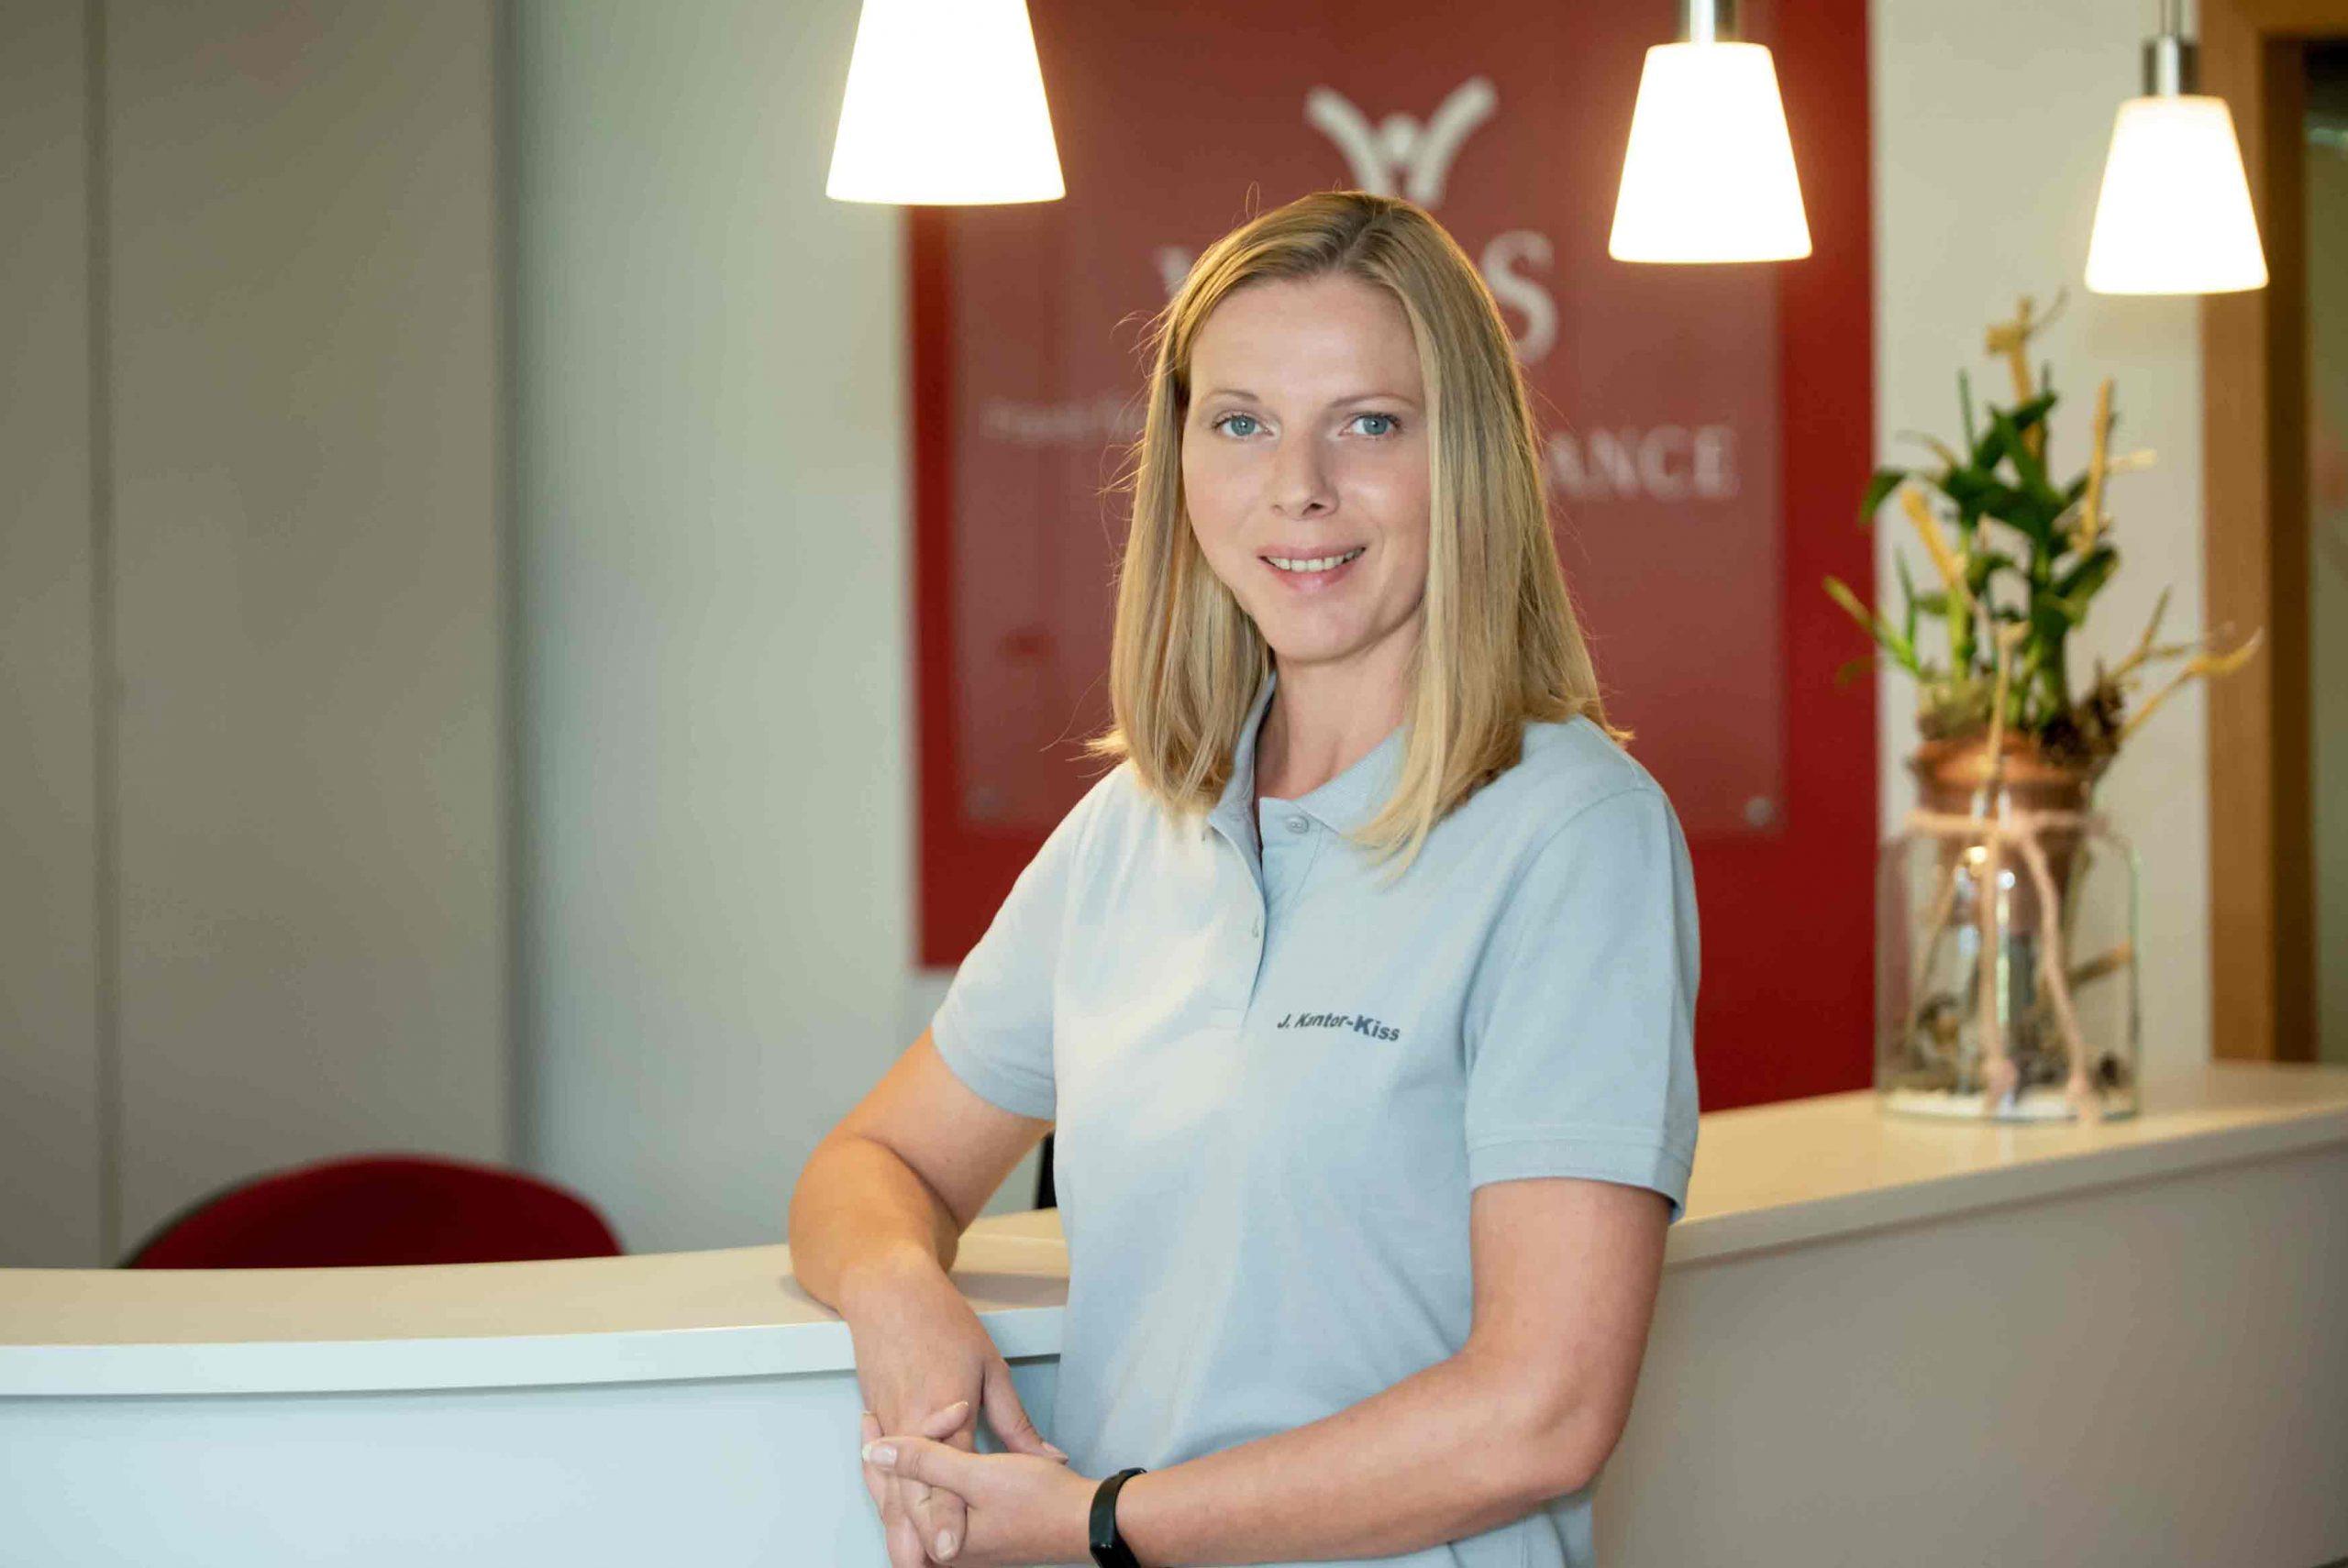 Jana Kantor-Kiss - Praxis Organisation Physiotherapie Wels